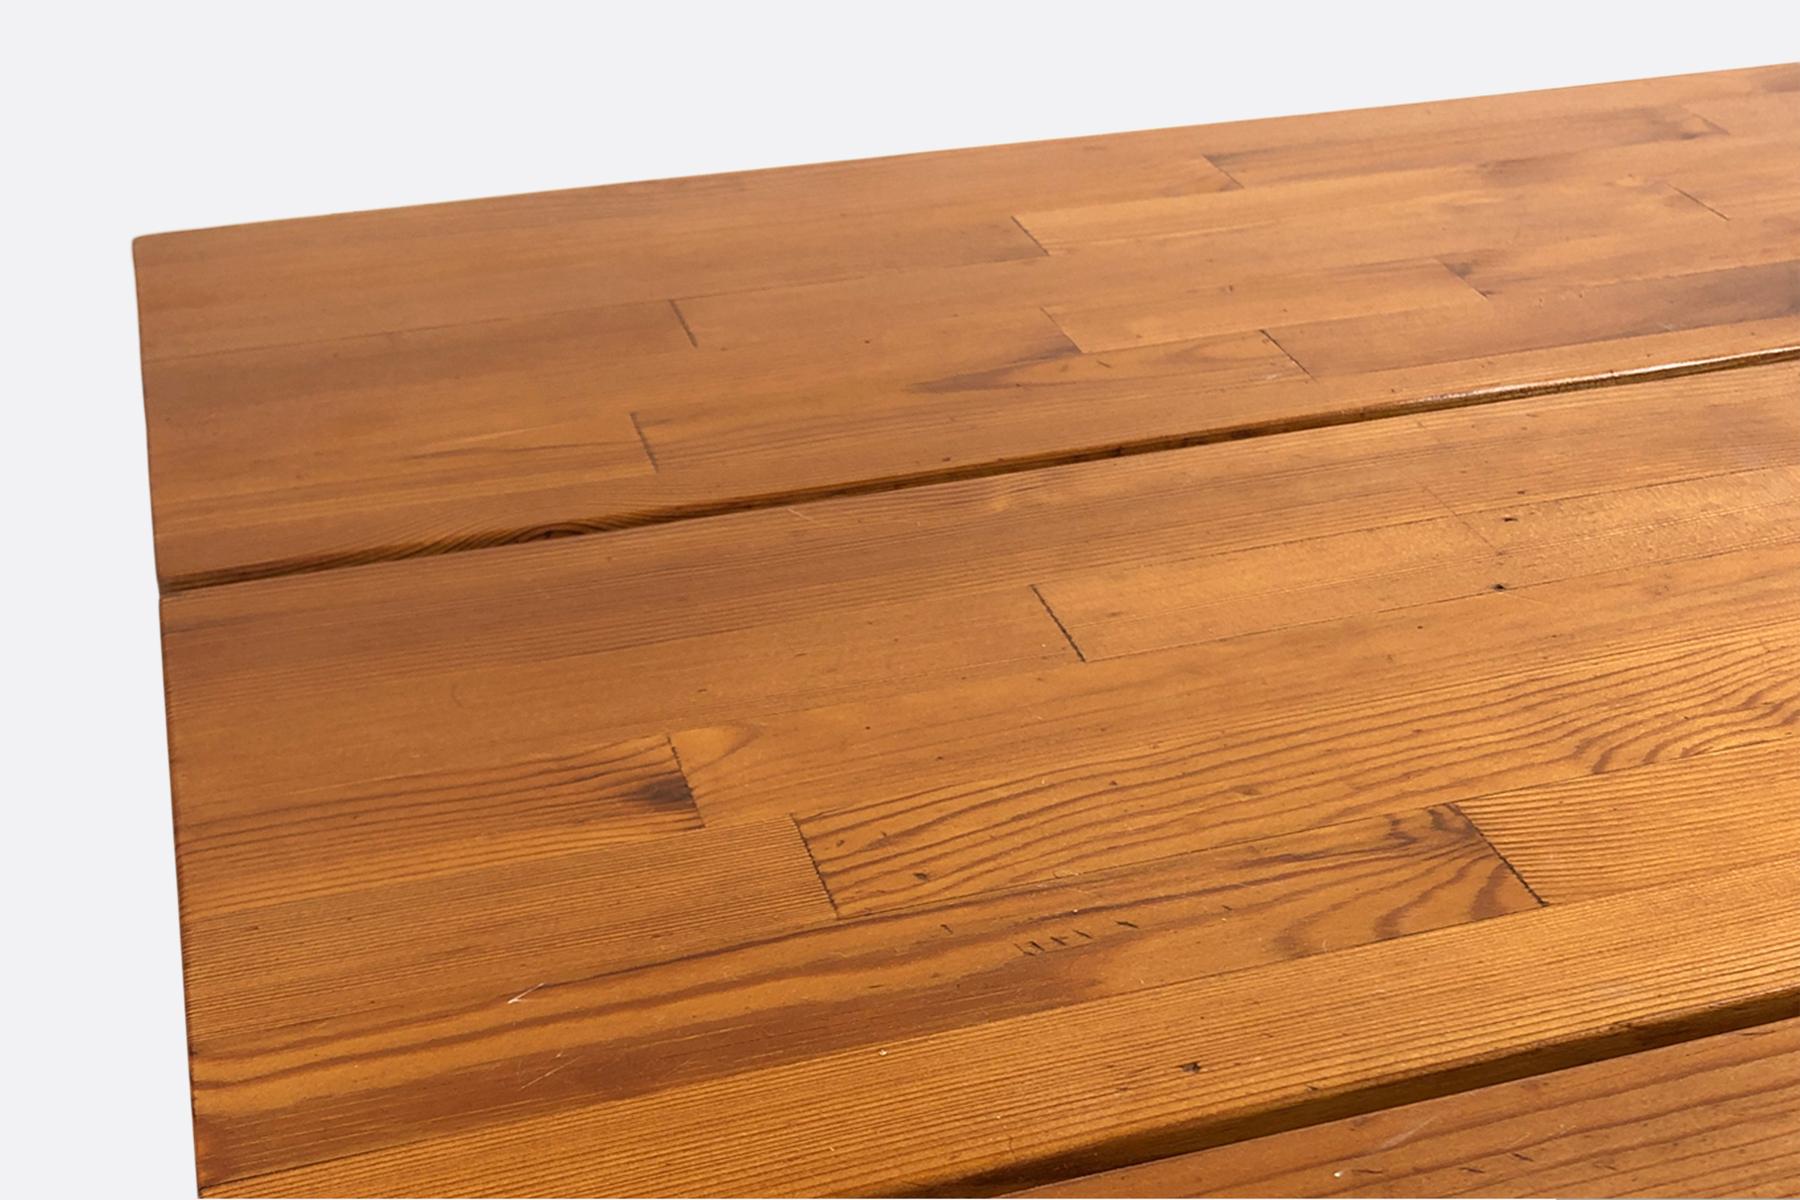 Pirkka coffee table